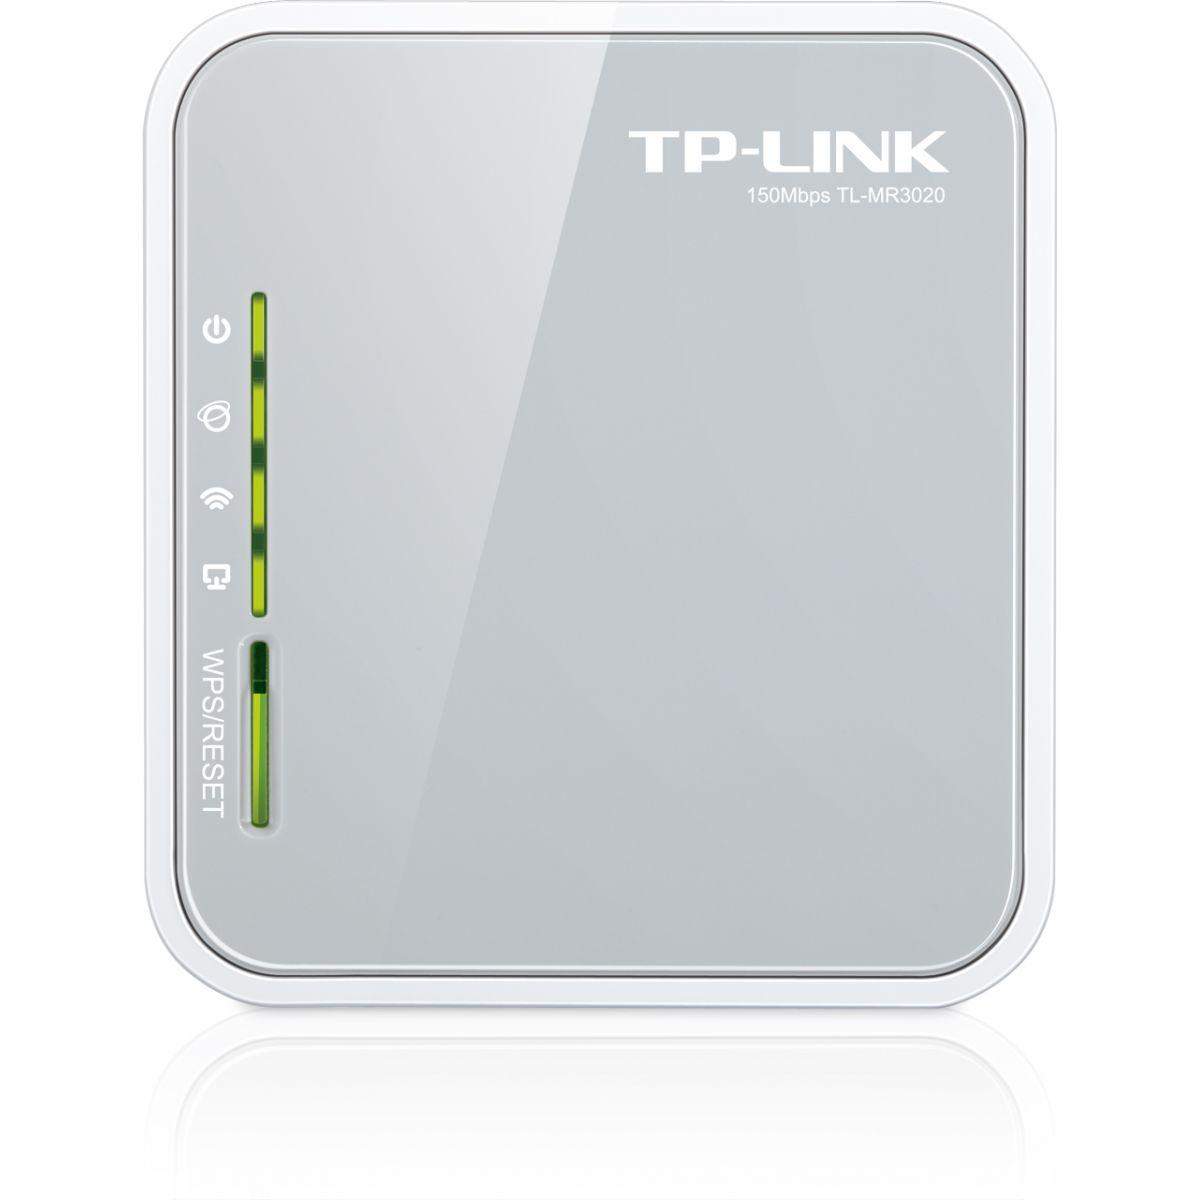 Roteador 3G Tp-Link Wireless Portátil TL-MR3020  - ShopNoroeste.com.br